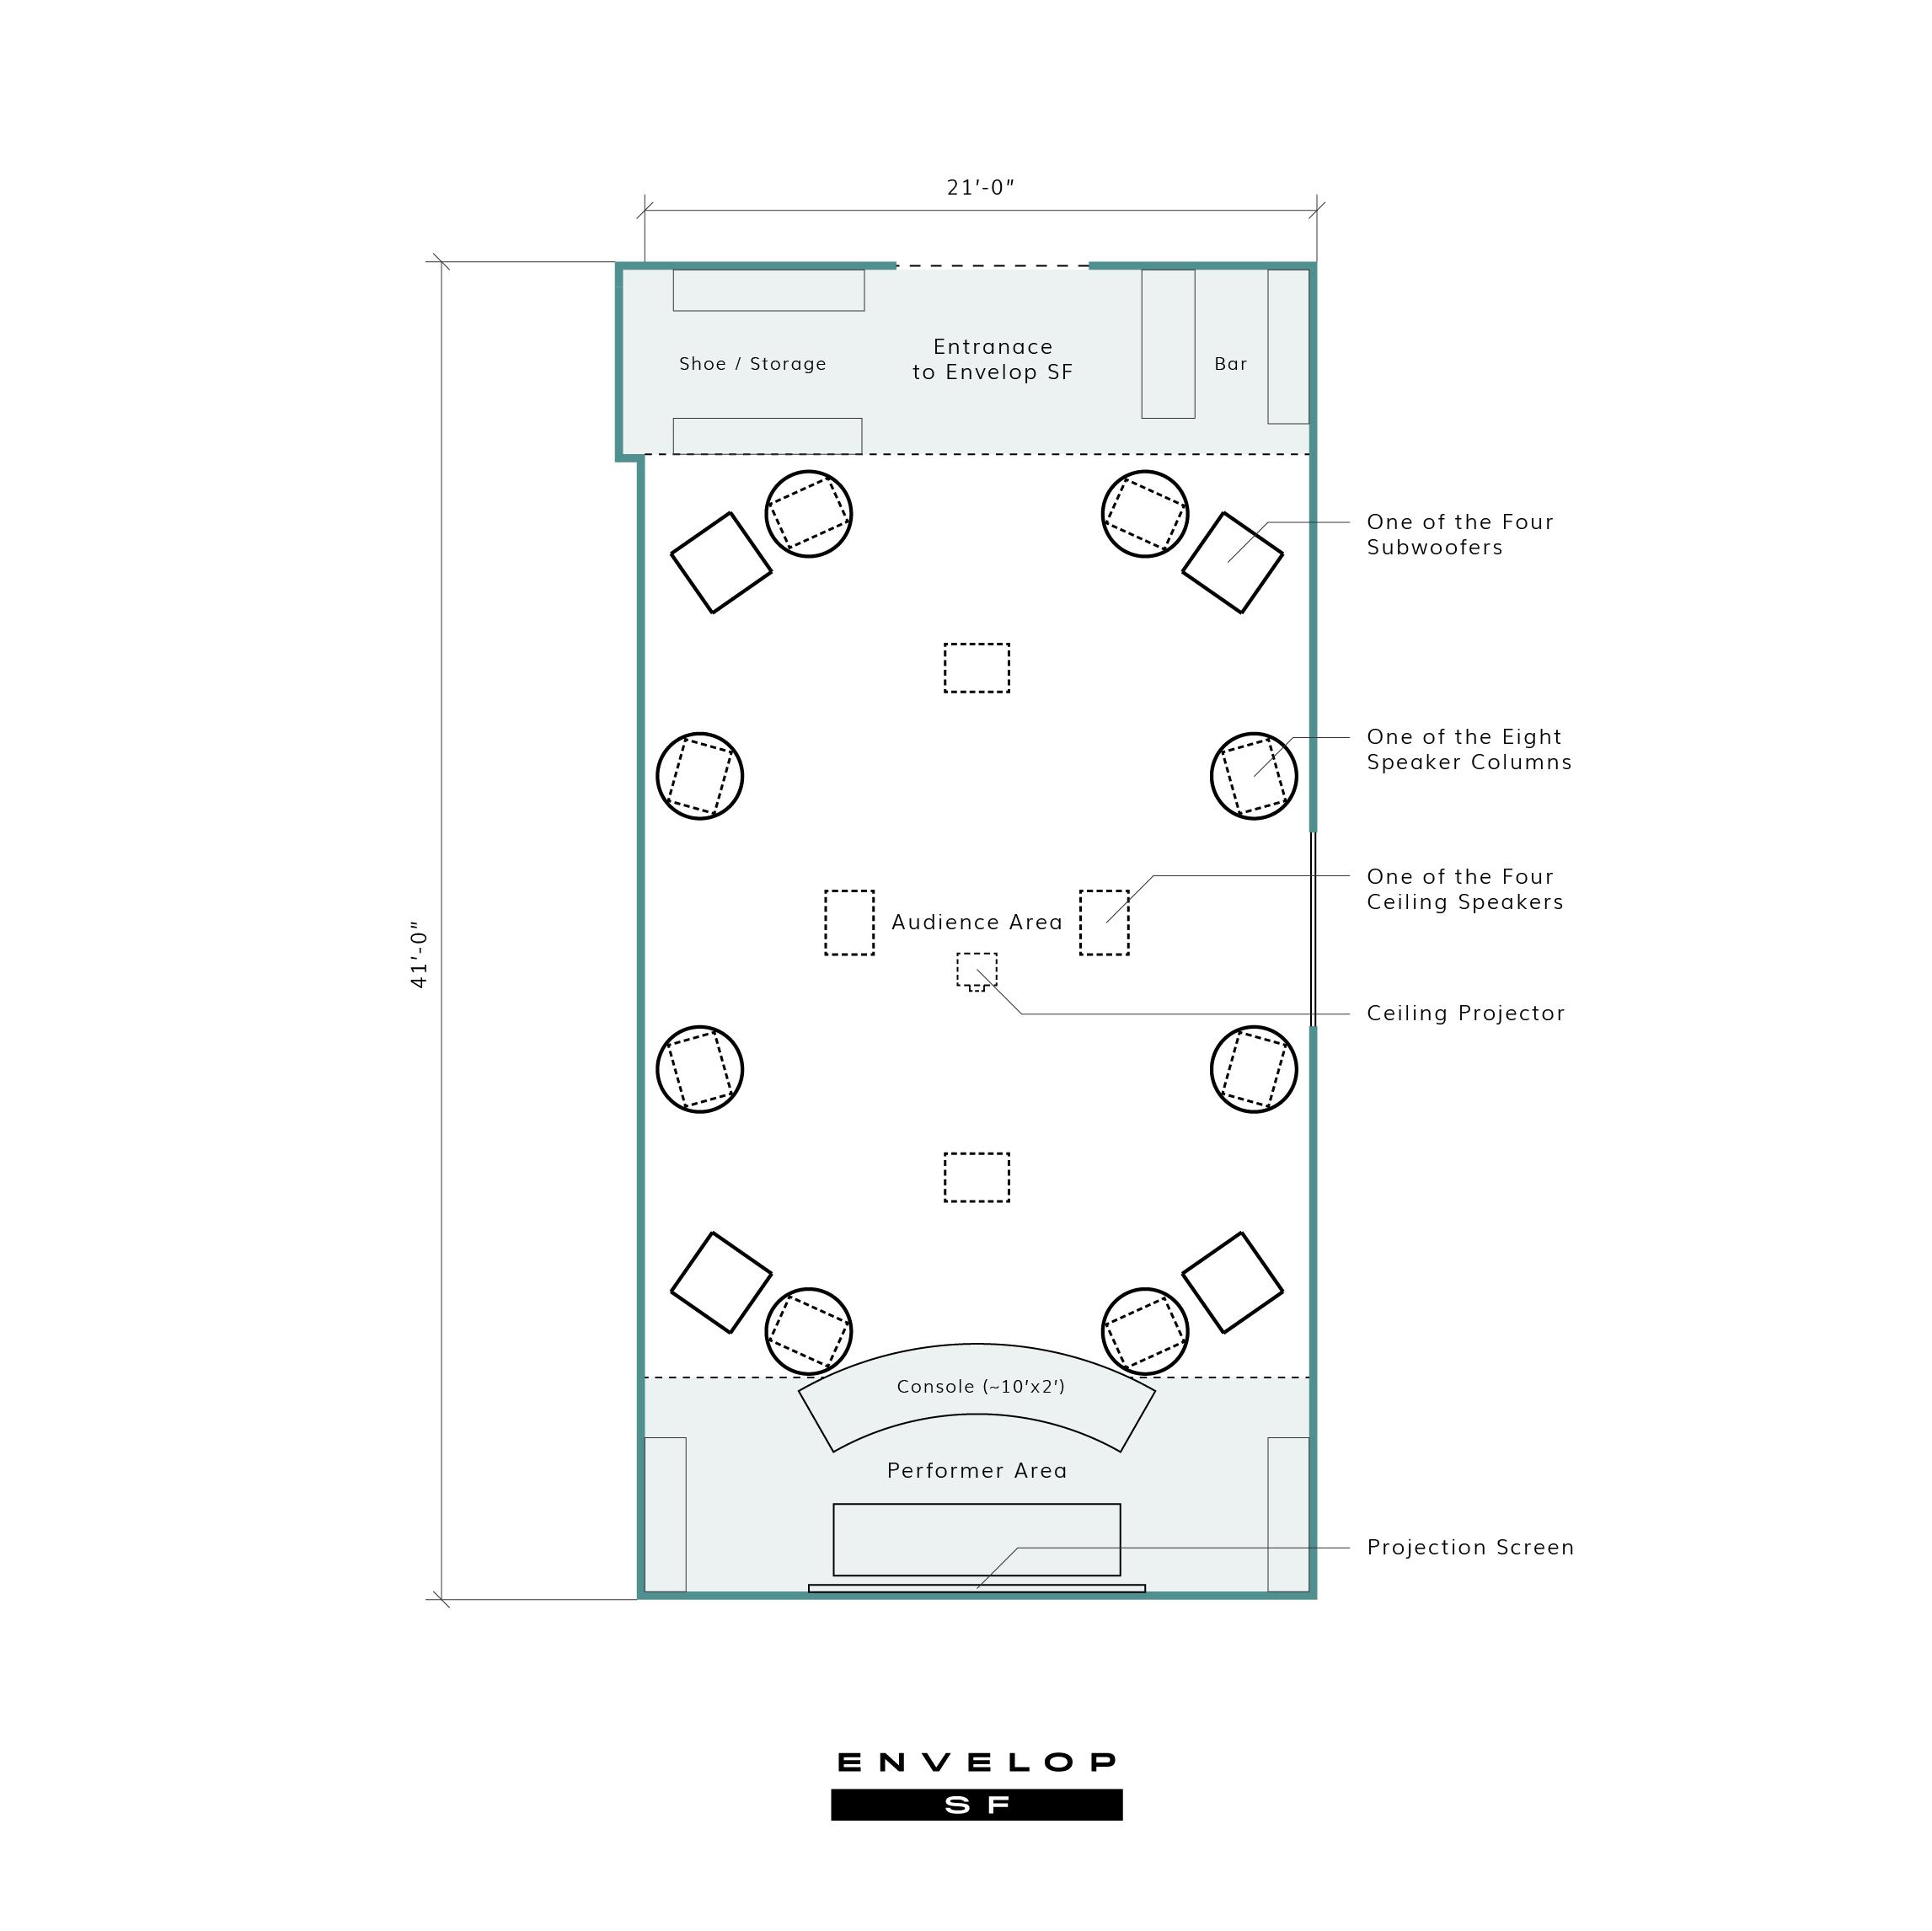 2018_Envelop_SF_space-info-diagram.jpg